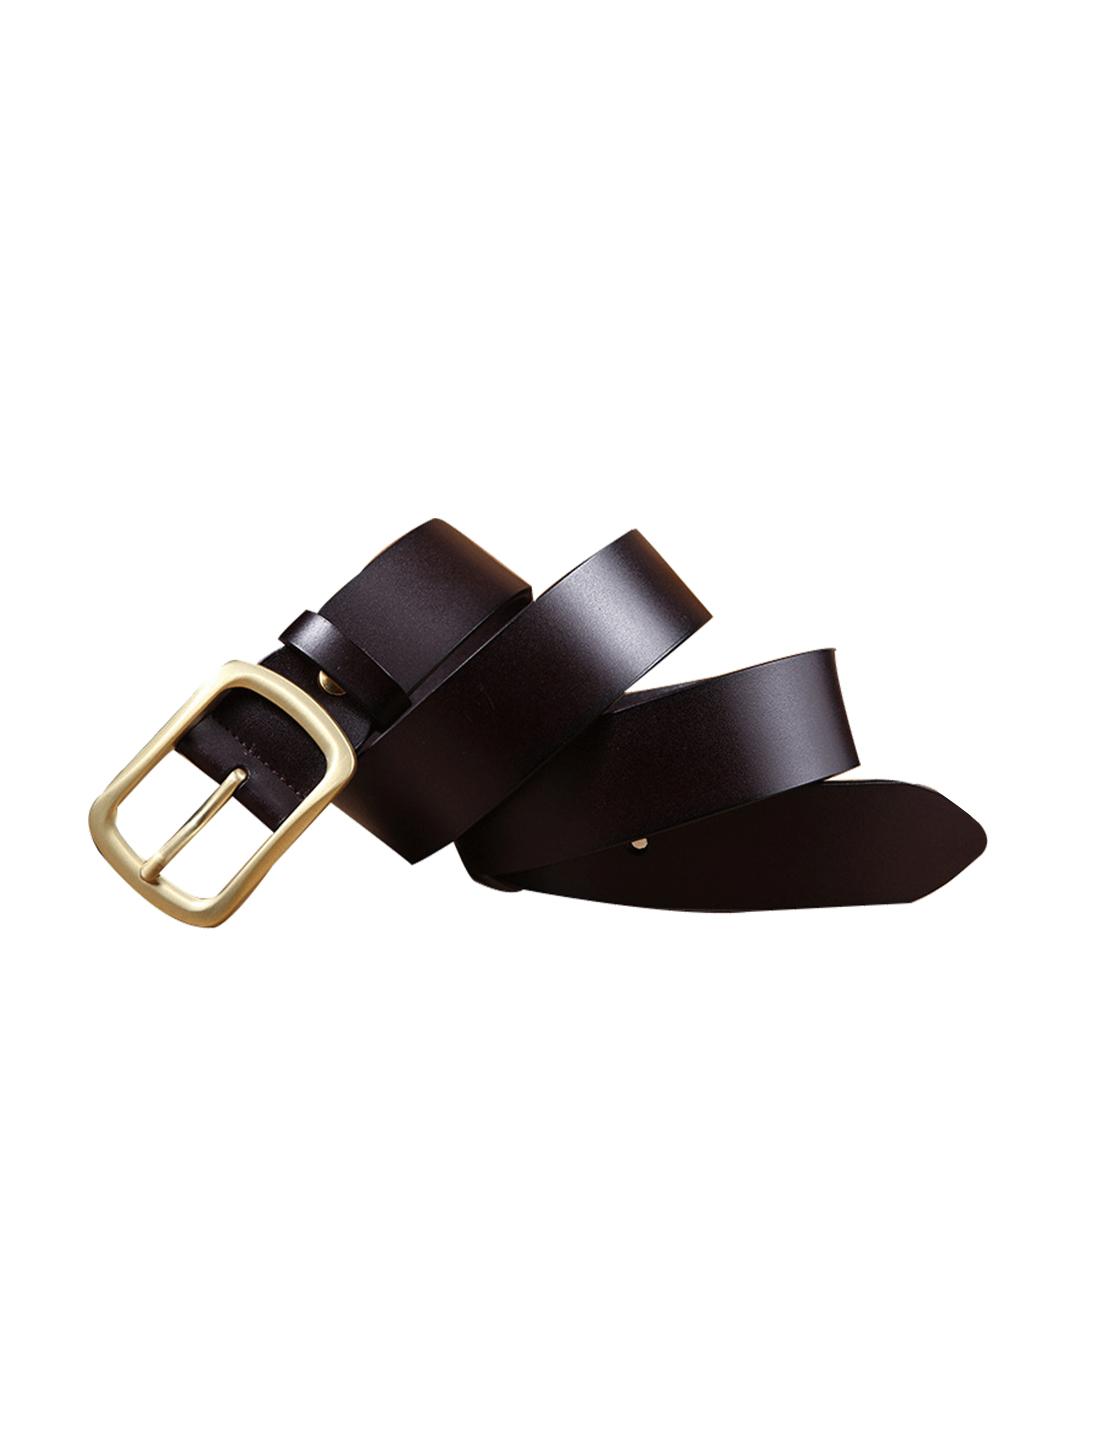 Mens Solid Pin Buckle Dress Leather Belt 38mm Width 1 1/2 Dark Brown 120cm